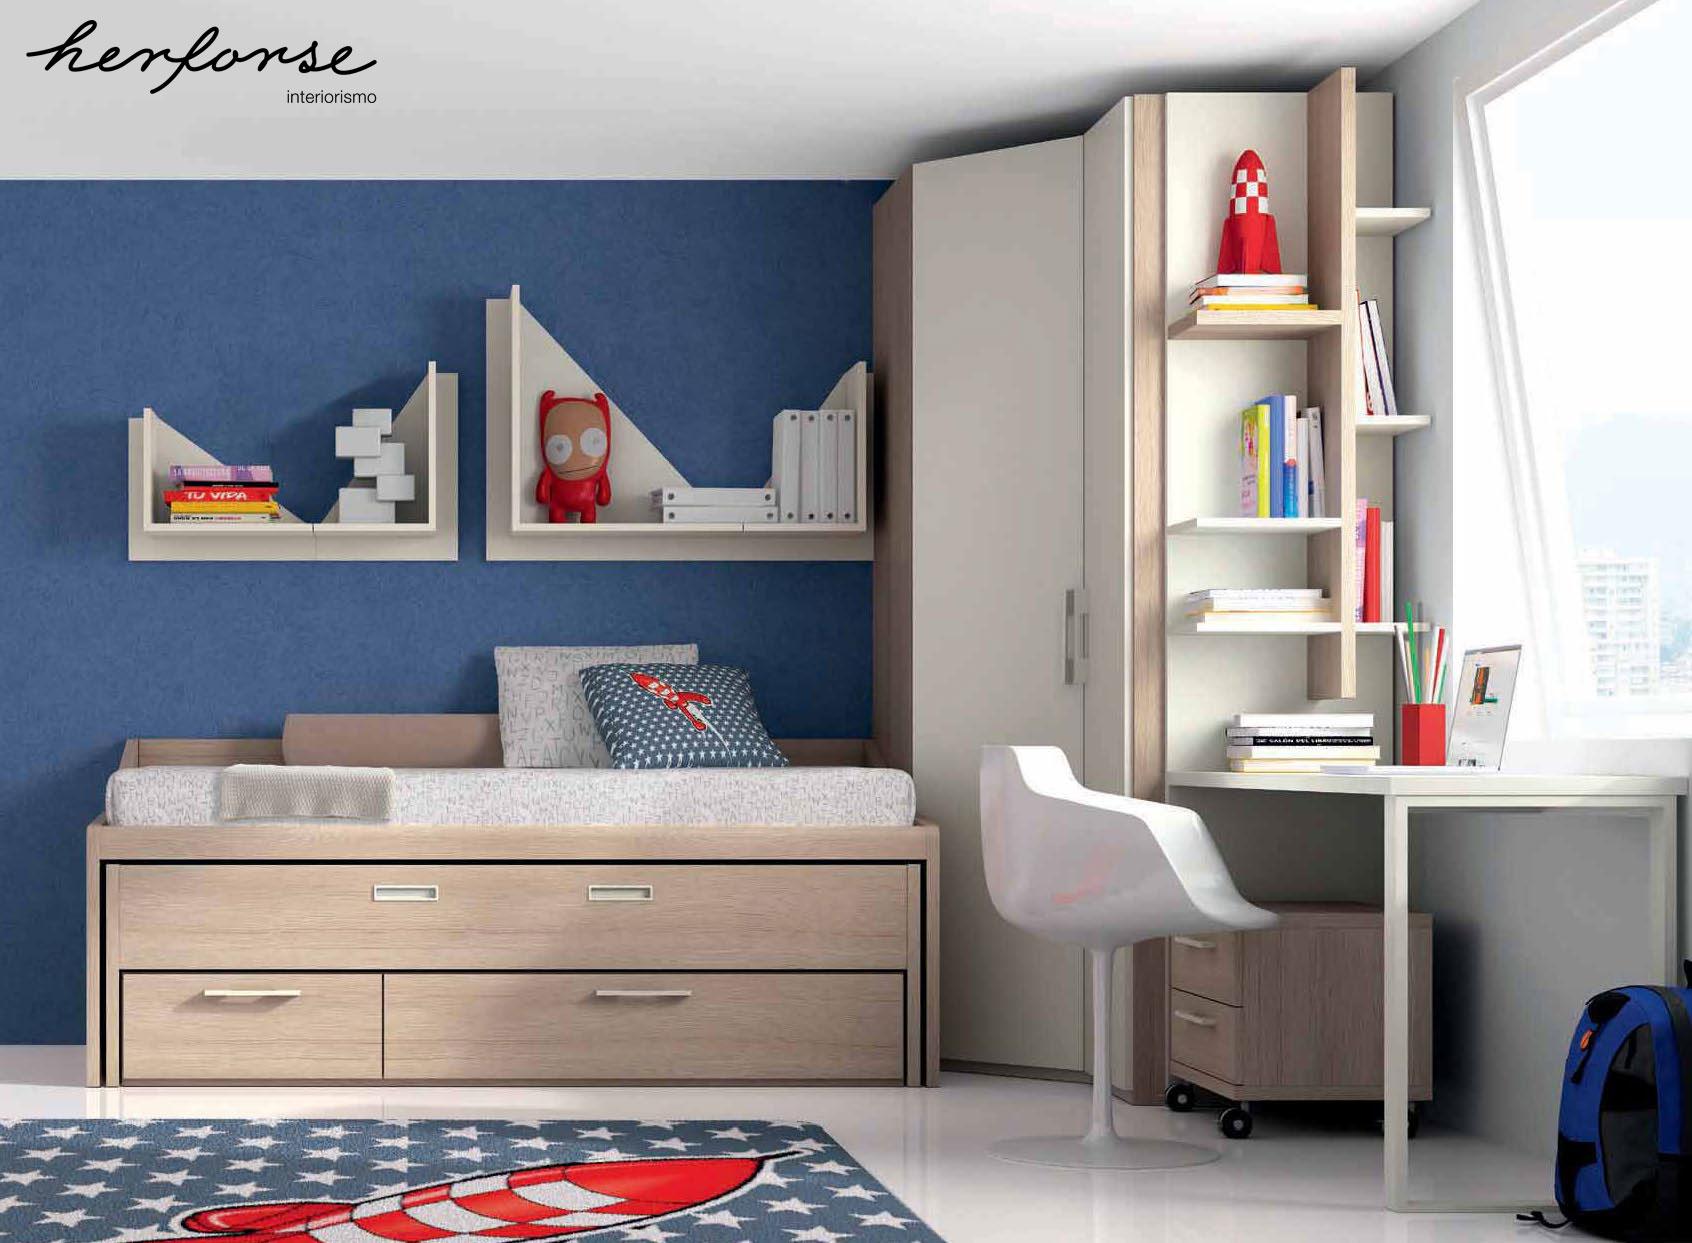 Compactos dobles camas juveniles herforseinteriorismo for Sofas para habitaciones juveniles